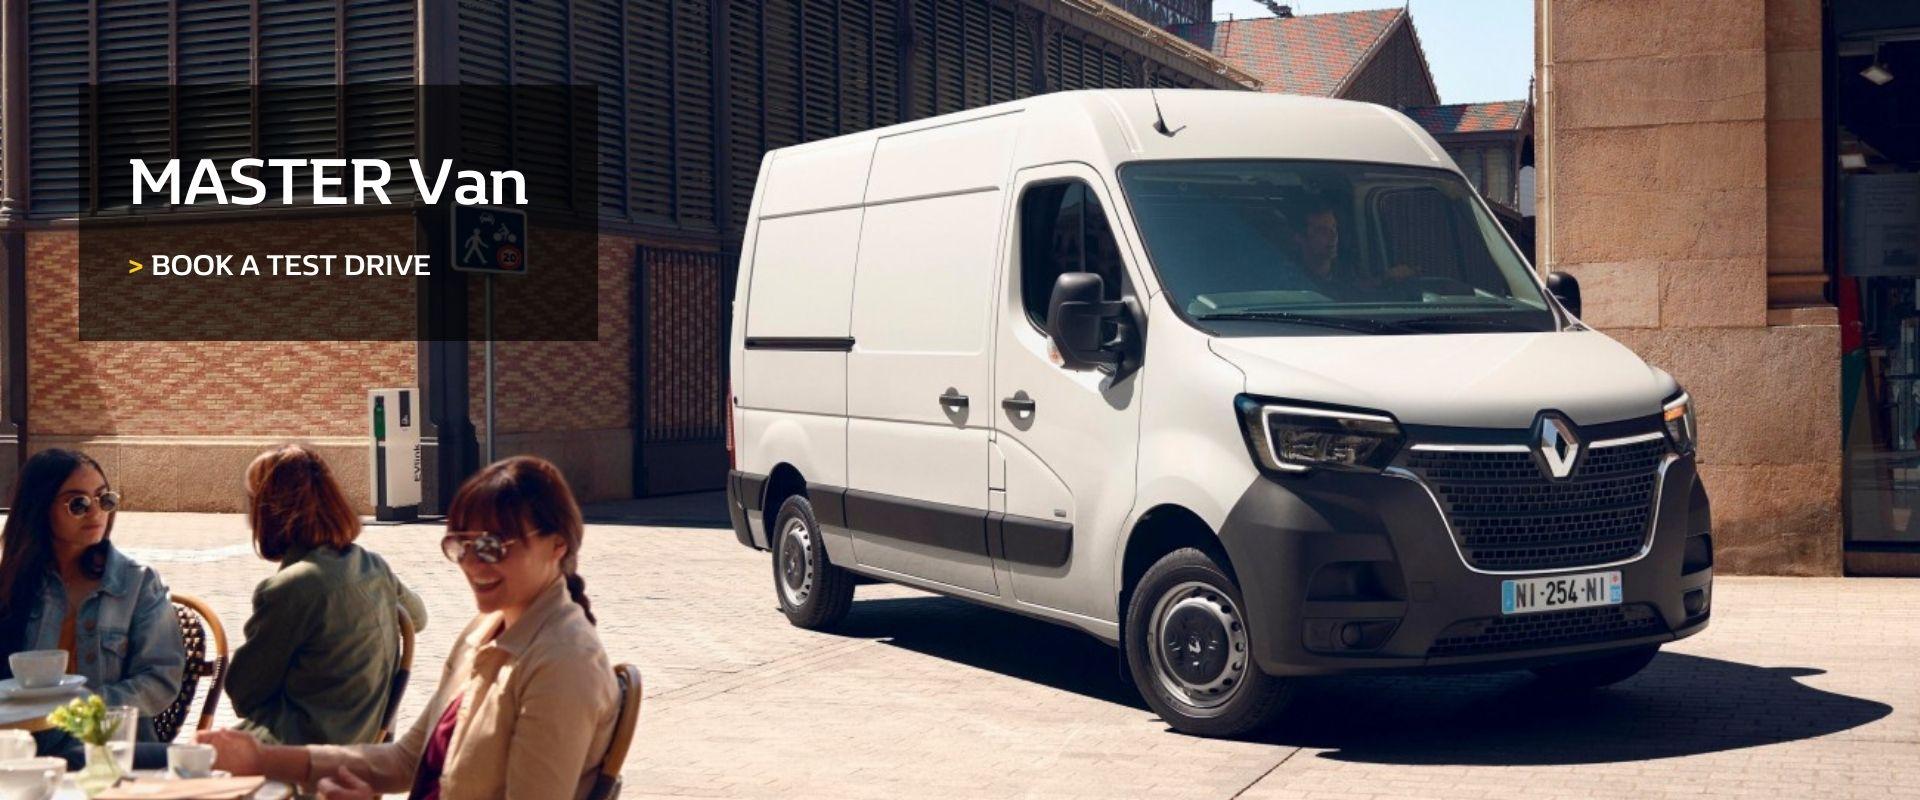 Renault Master Van -  Book a test drive today at DC Motors Renault